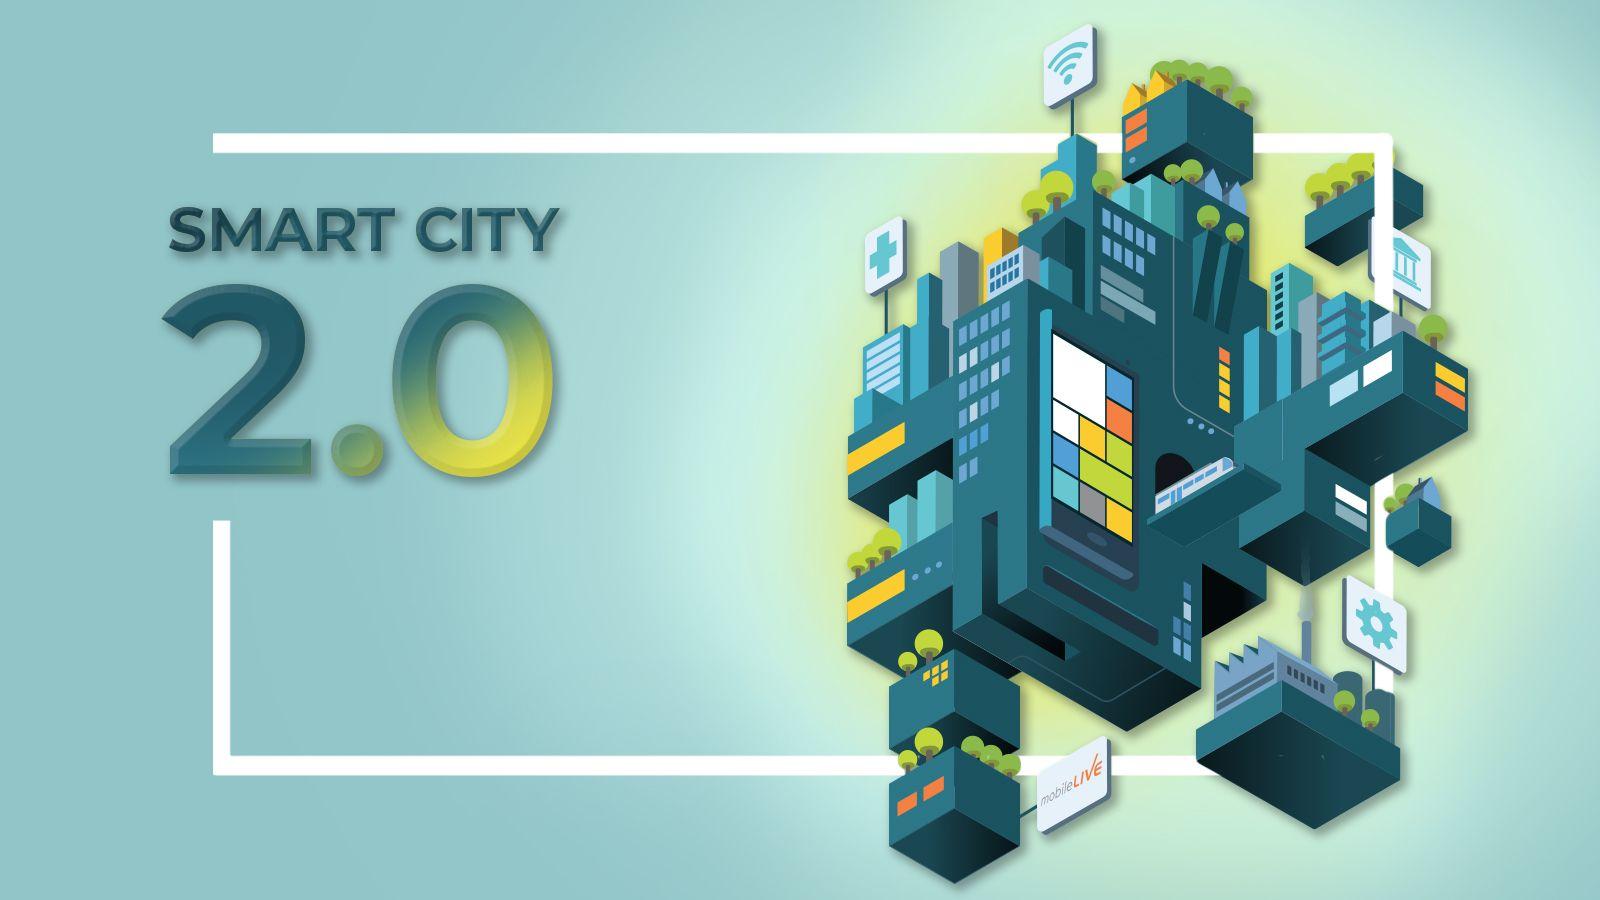 Smart City 2.0